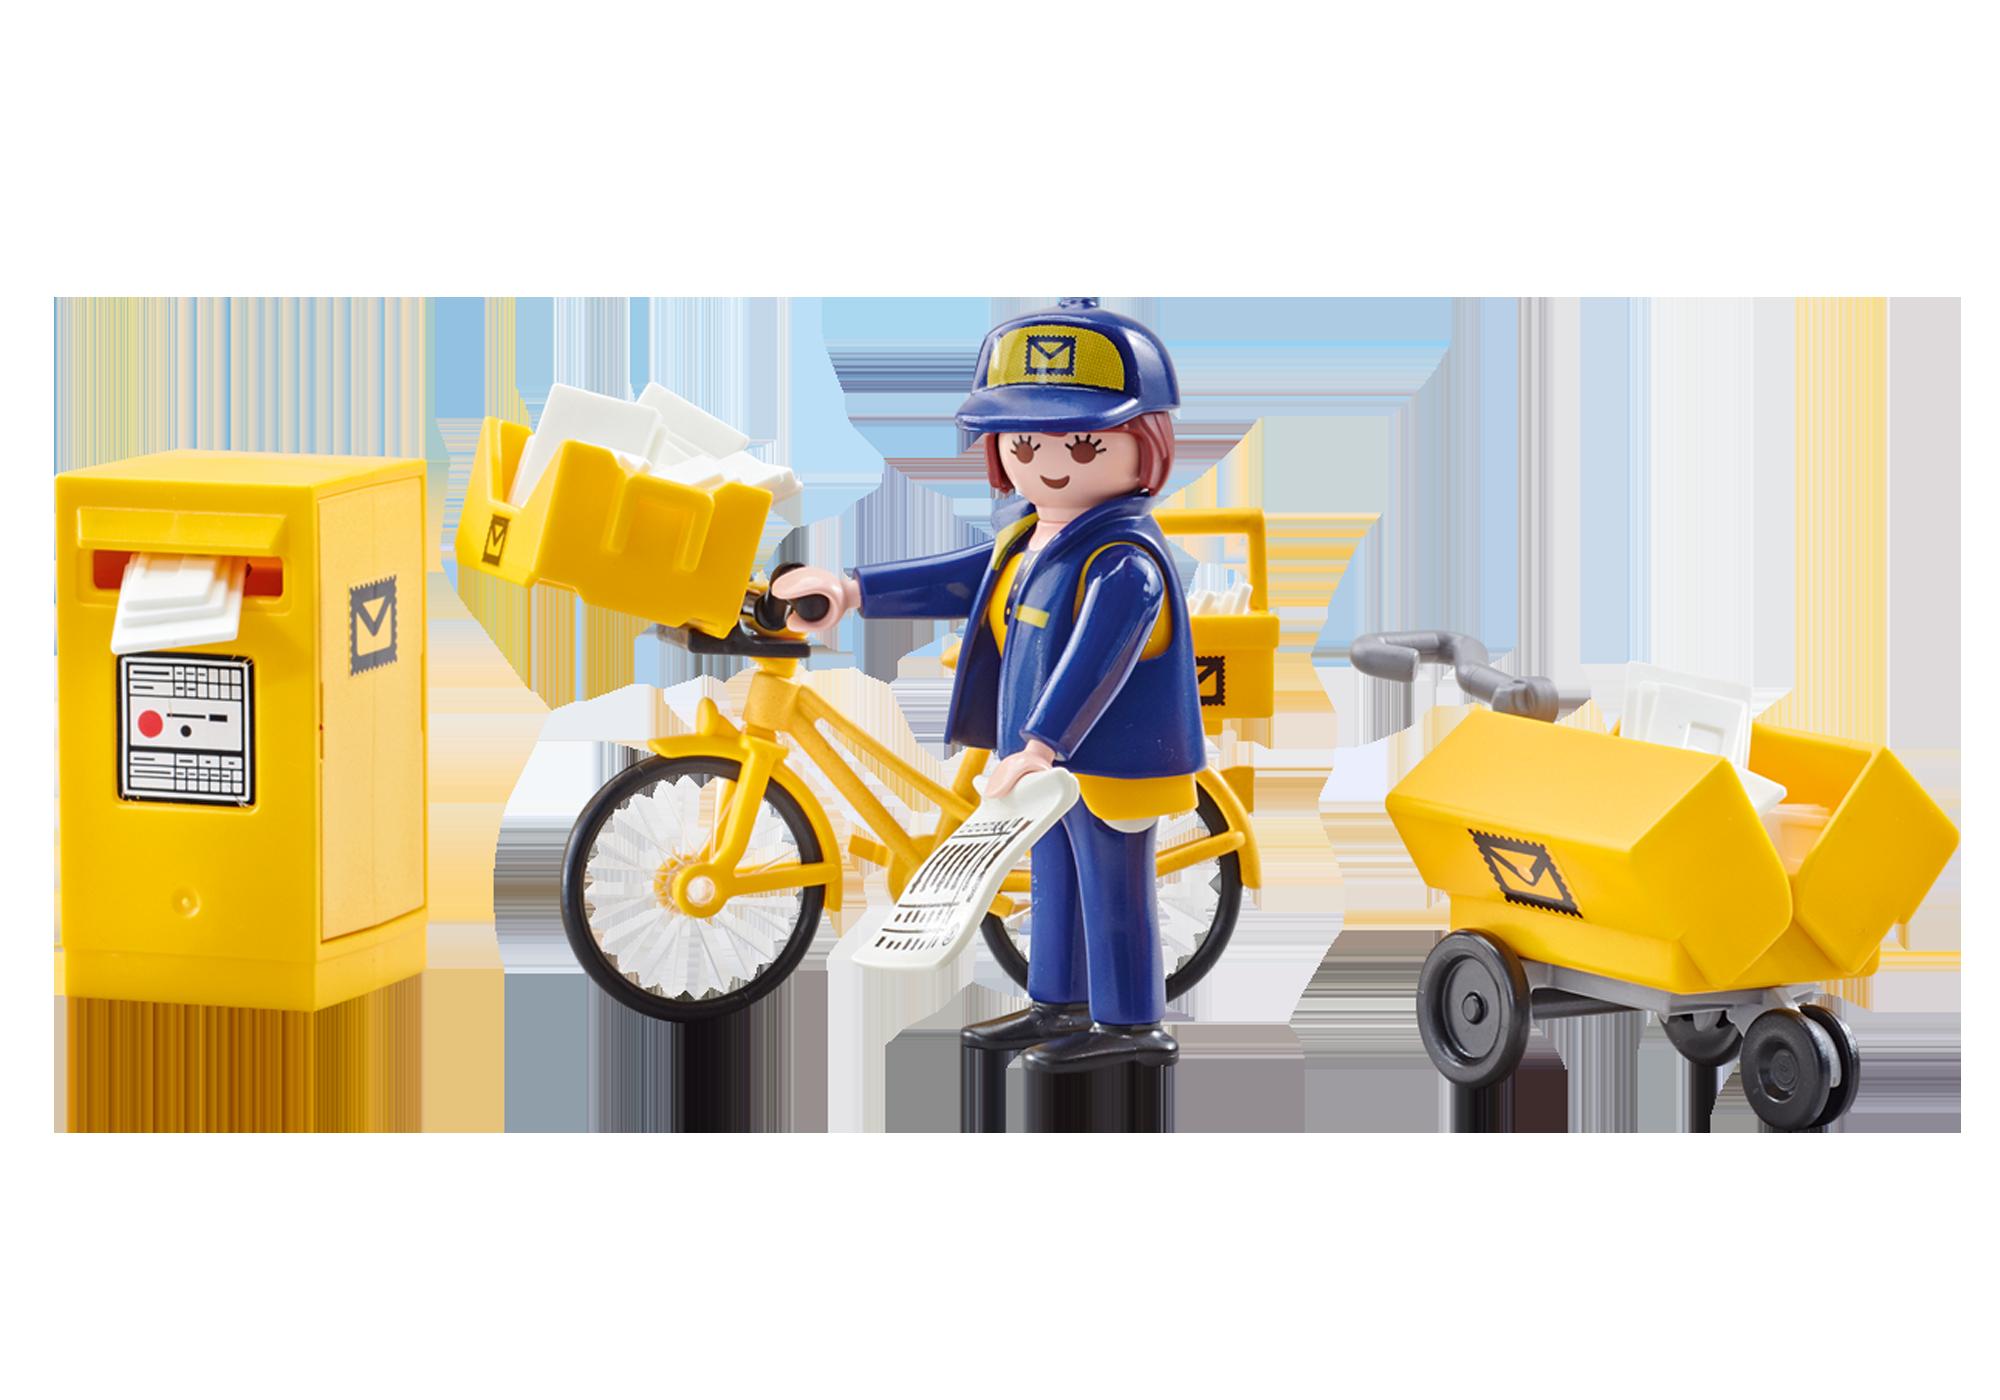 http://media.playmobil.com/i/playmobil/9806_product_detail/Factrice avec vélo